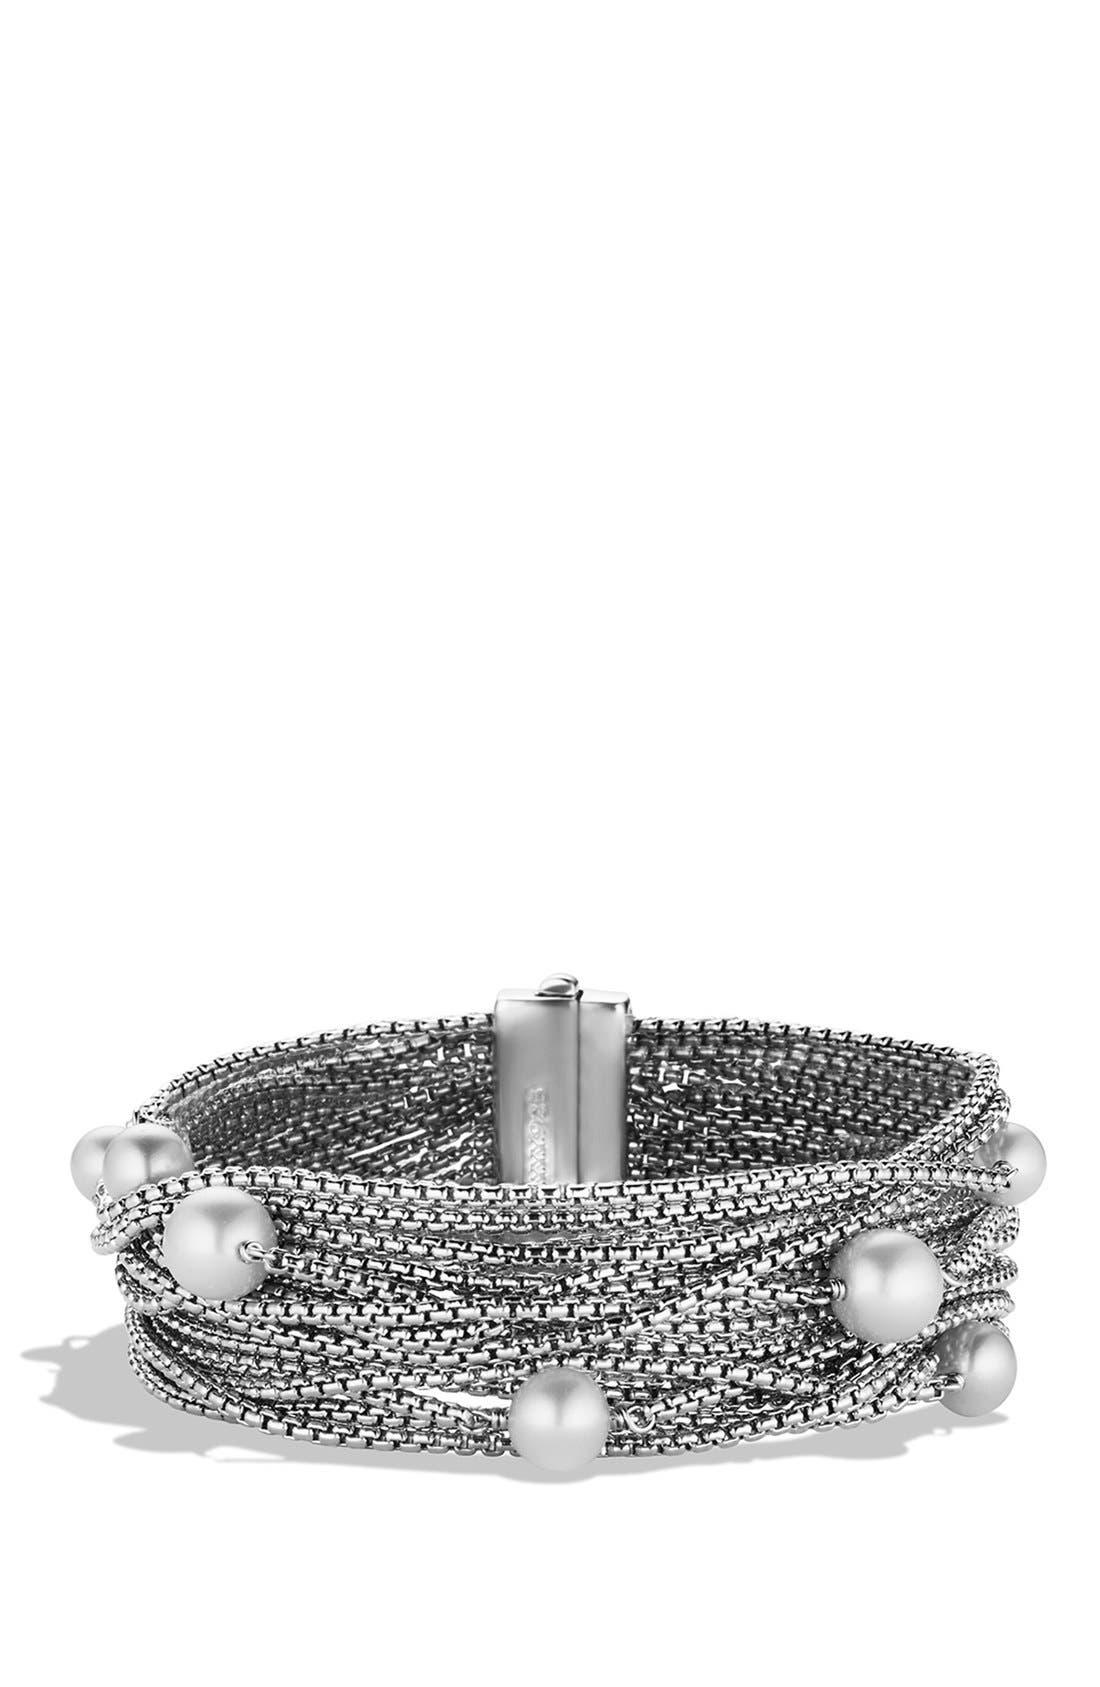 Alternate Image 1 Selected - David Yurman Sixteen-Row Chain Bracelet with Pearls